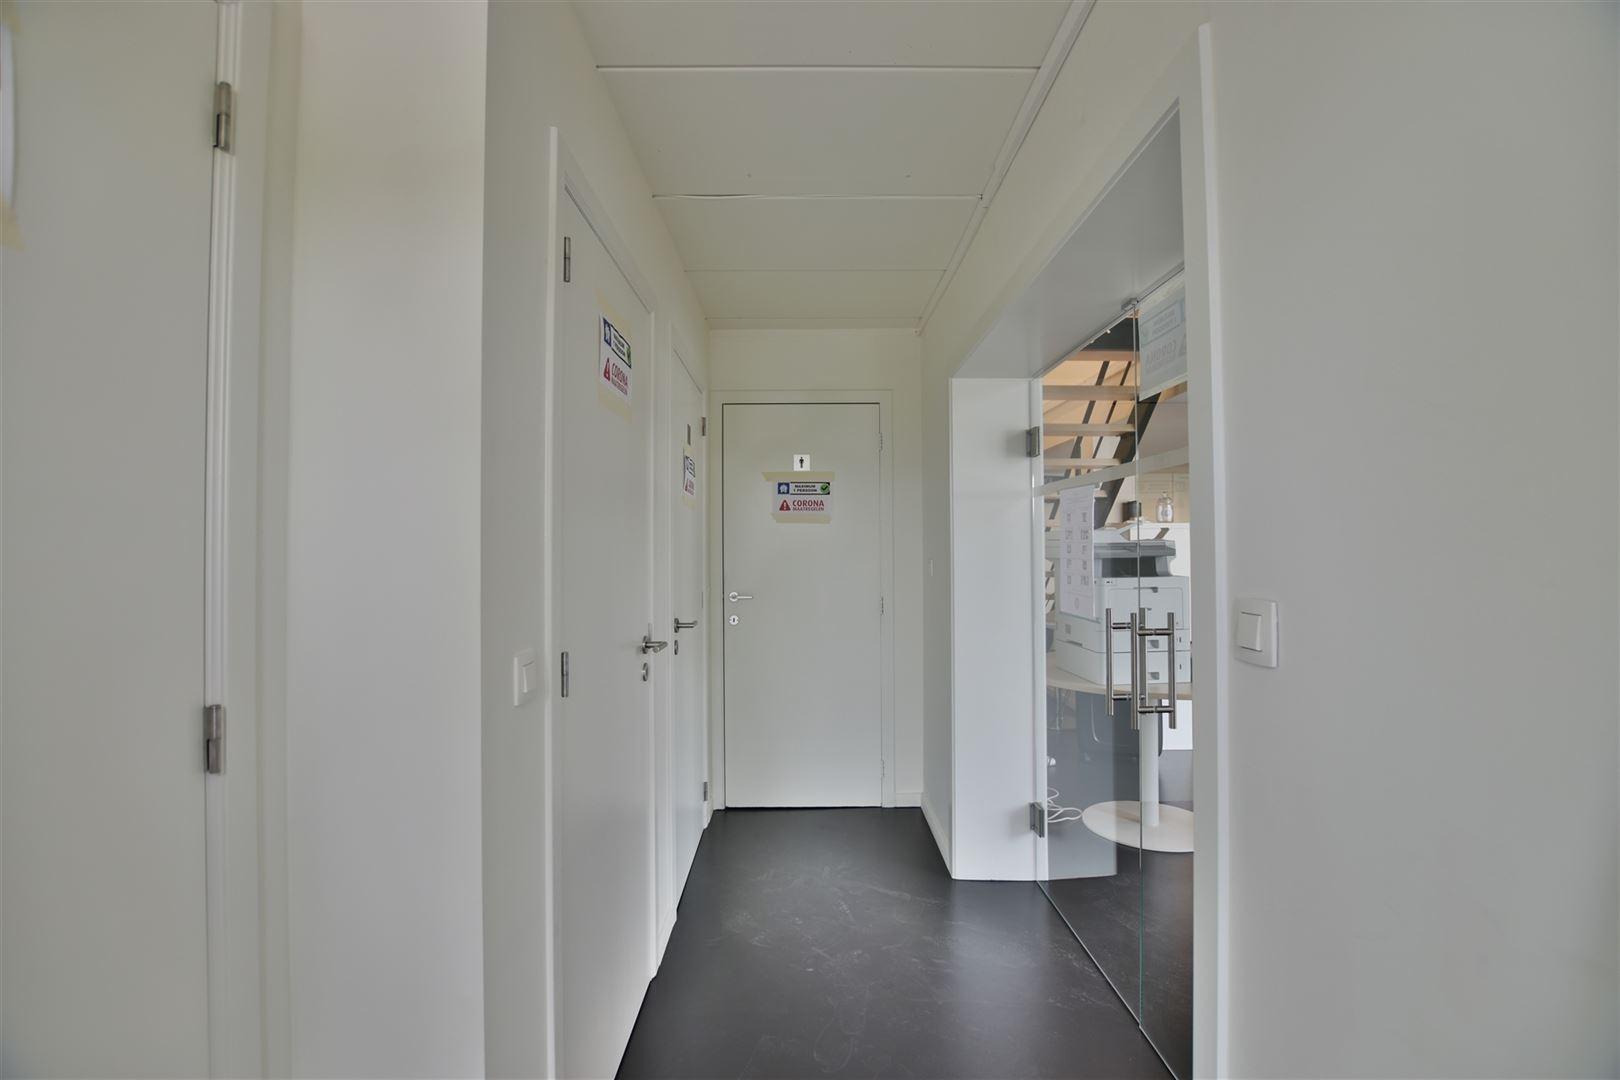 Foto 9 : Magazijn te 9200 DENDERMONDE (België) - Prijs € 559.000